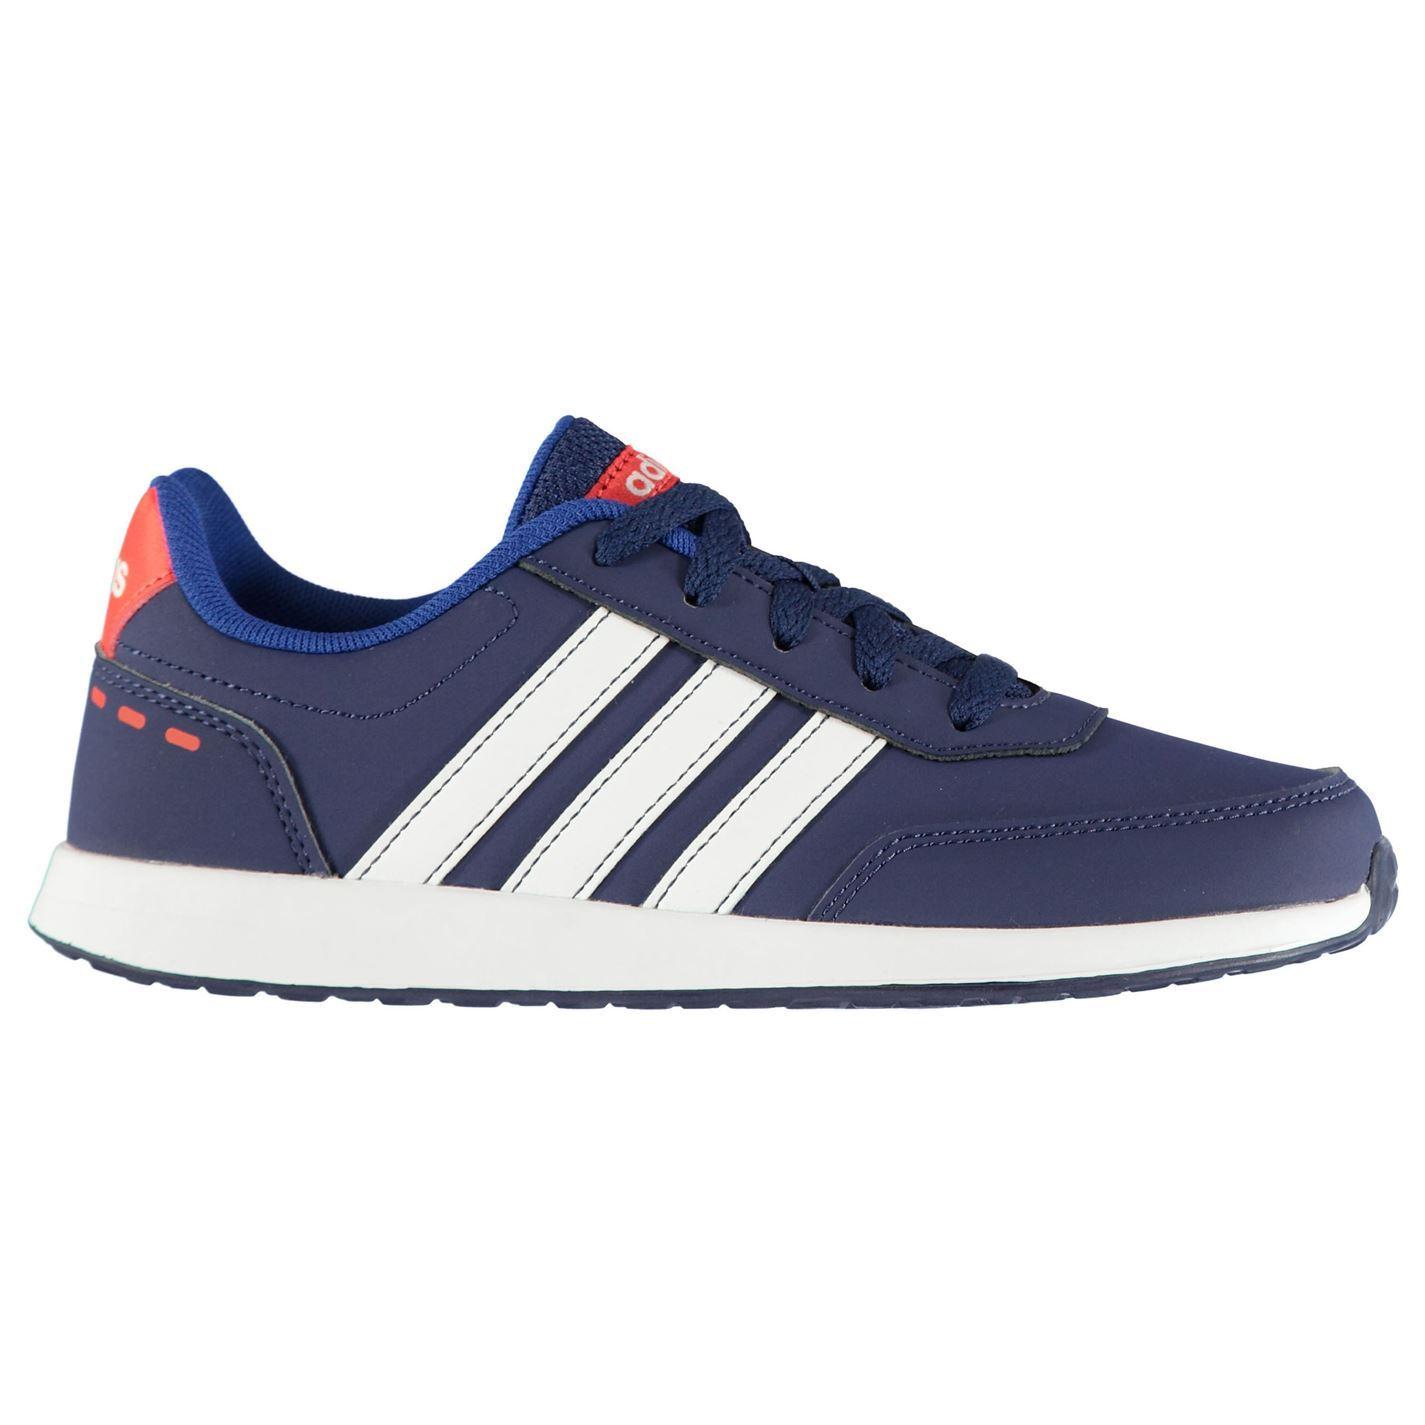 miniatura 5 - ADIDAS-Switch-Nubuck-Scarpe-da-ginnastica-bambino-ragazzo-calzature